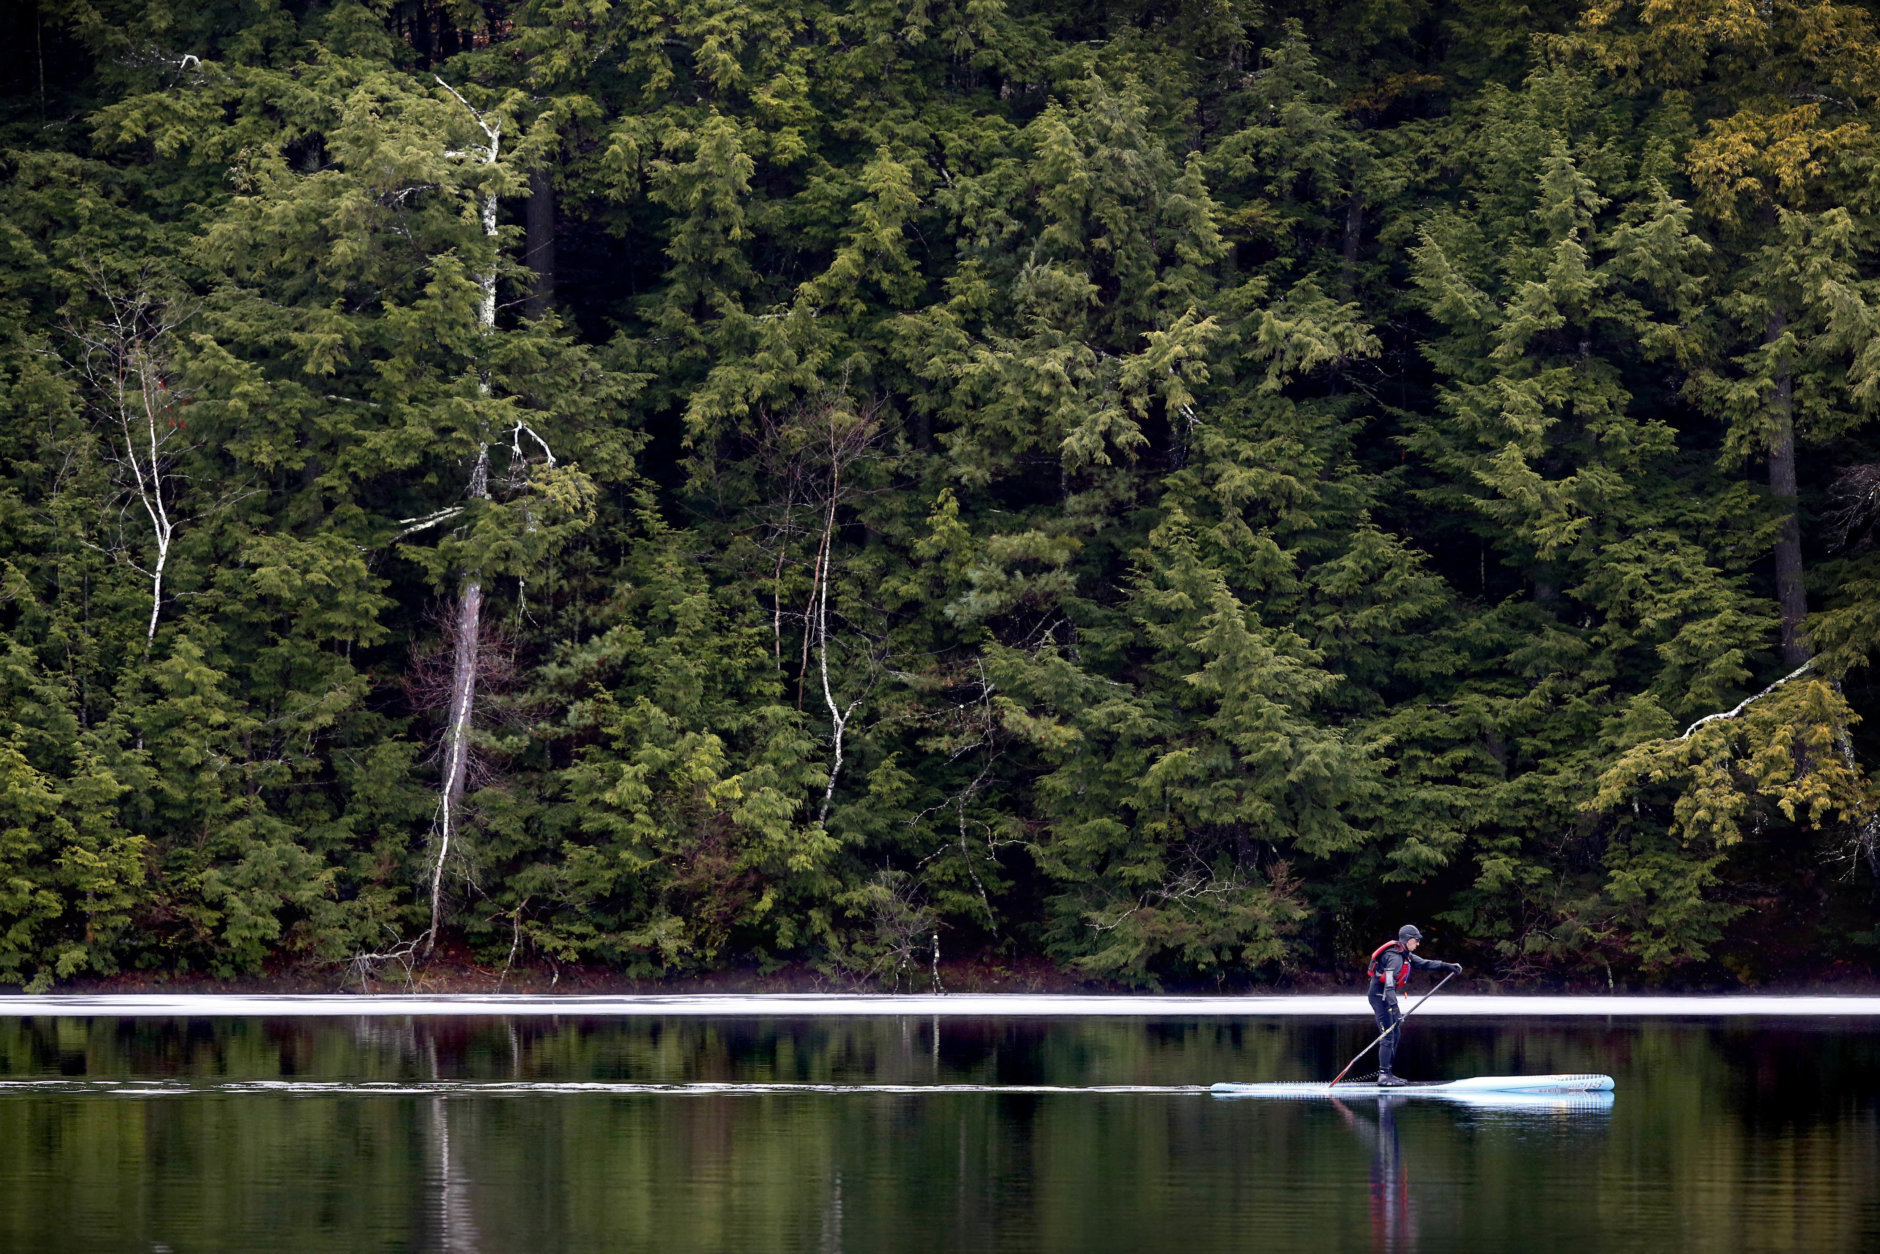 Jeff Warren of Auburn, Maine glides across Lower Range Pond on his paddleboard, Thursday, March 17, 2016, in Poland, Maine. (AP Photo/Robert F. Bukaty)